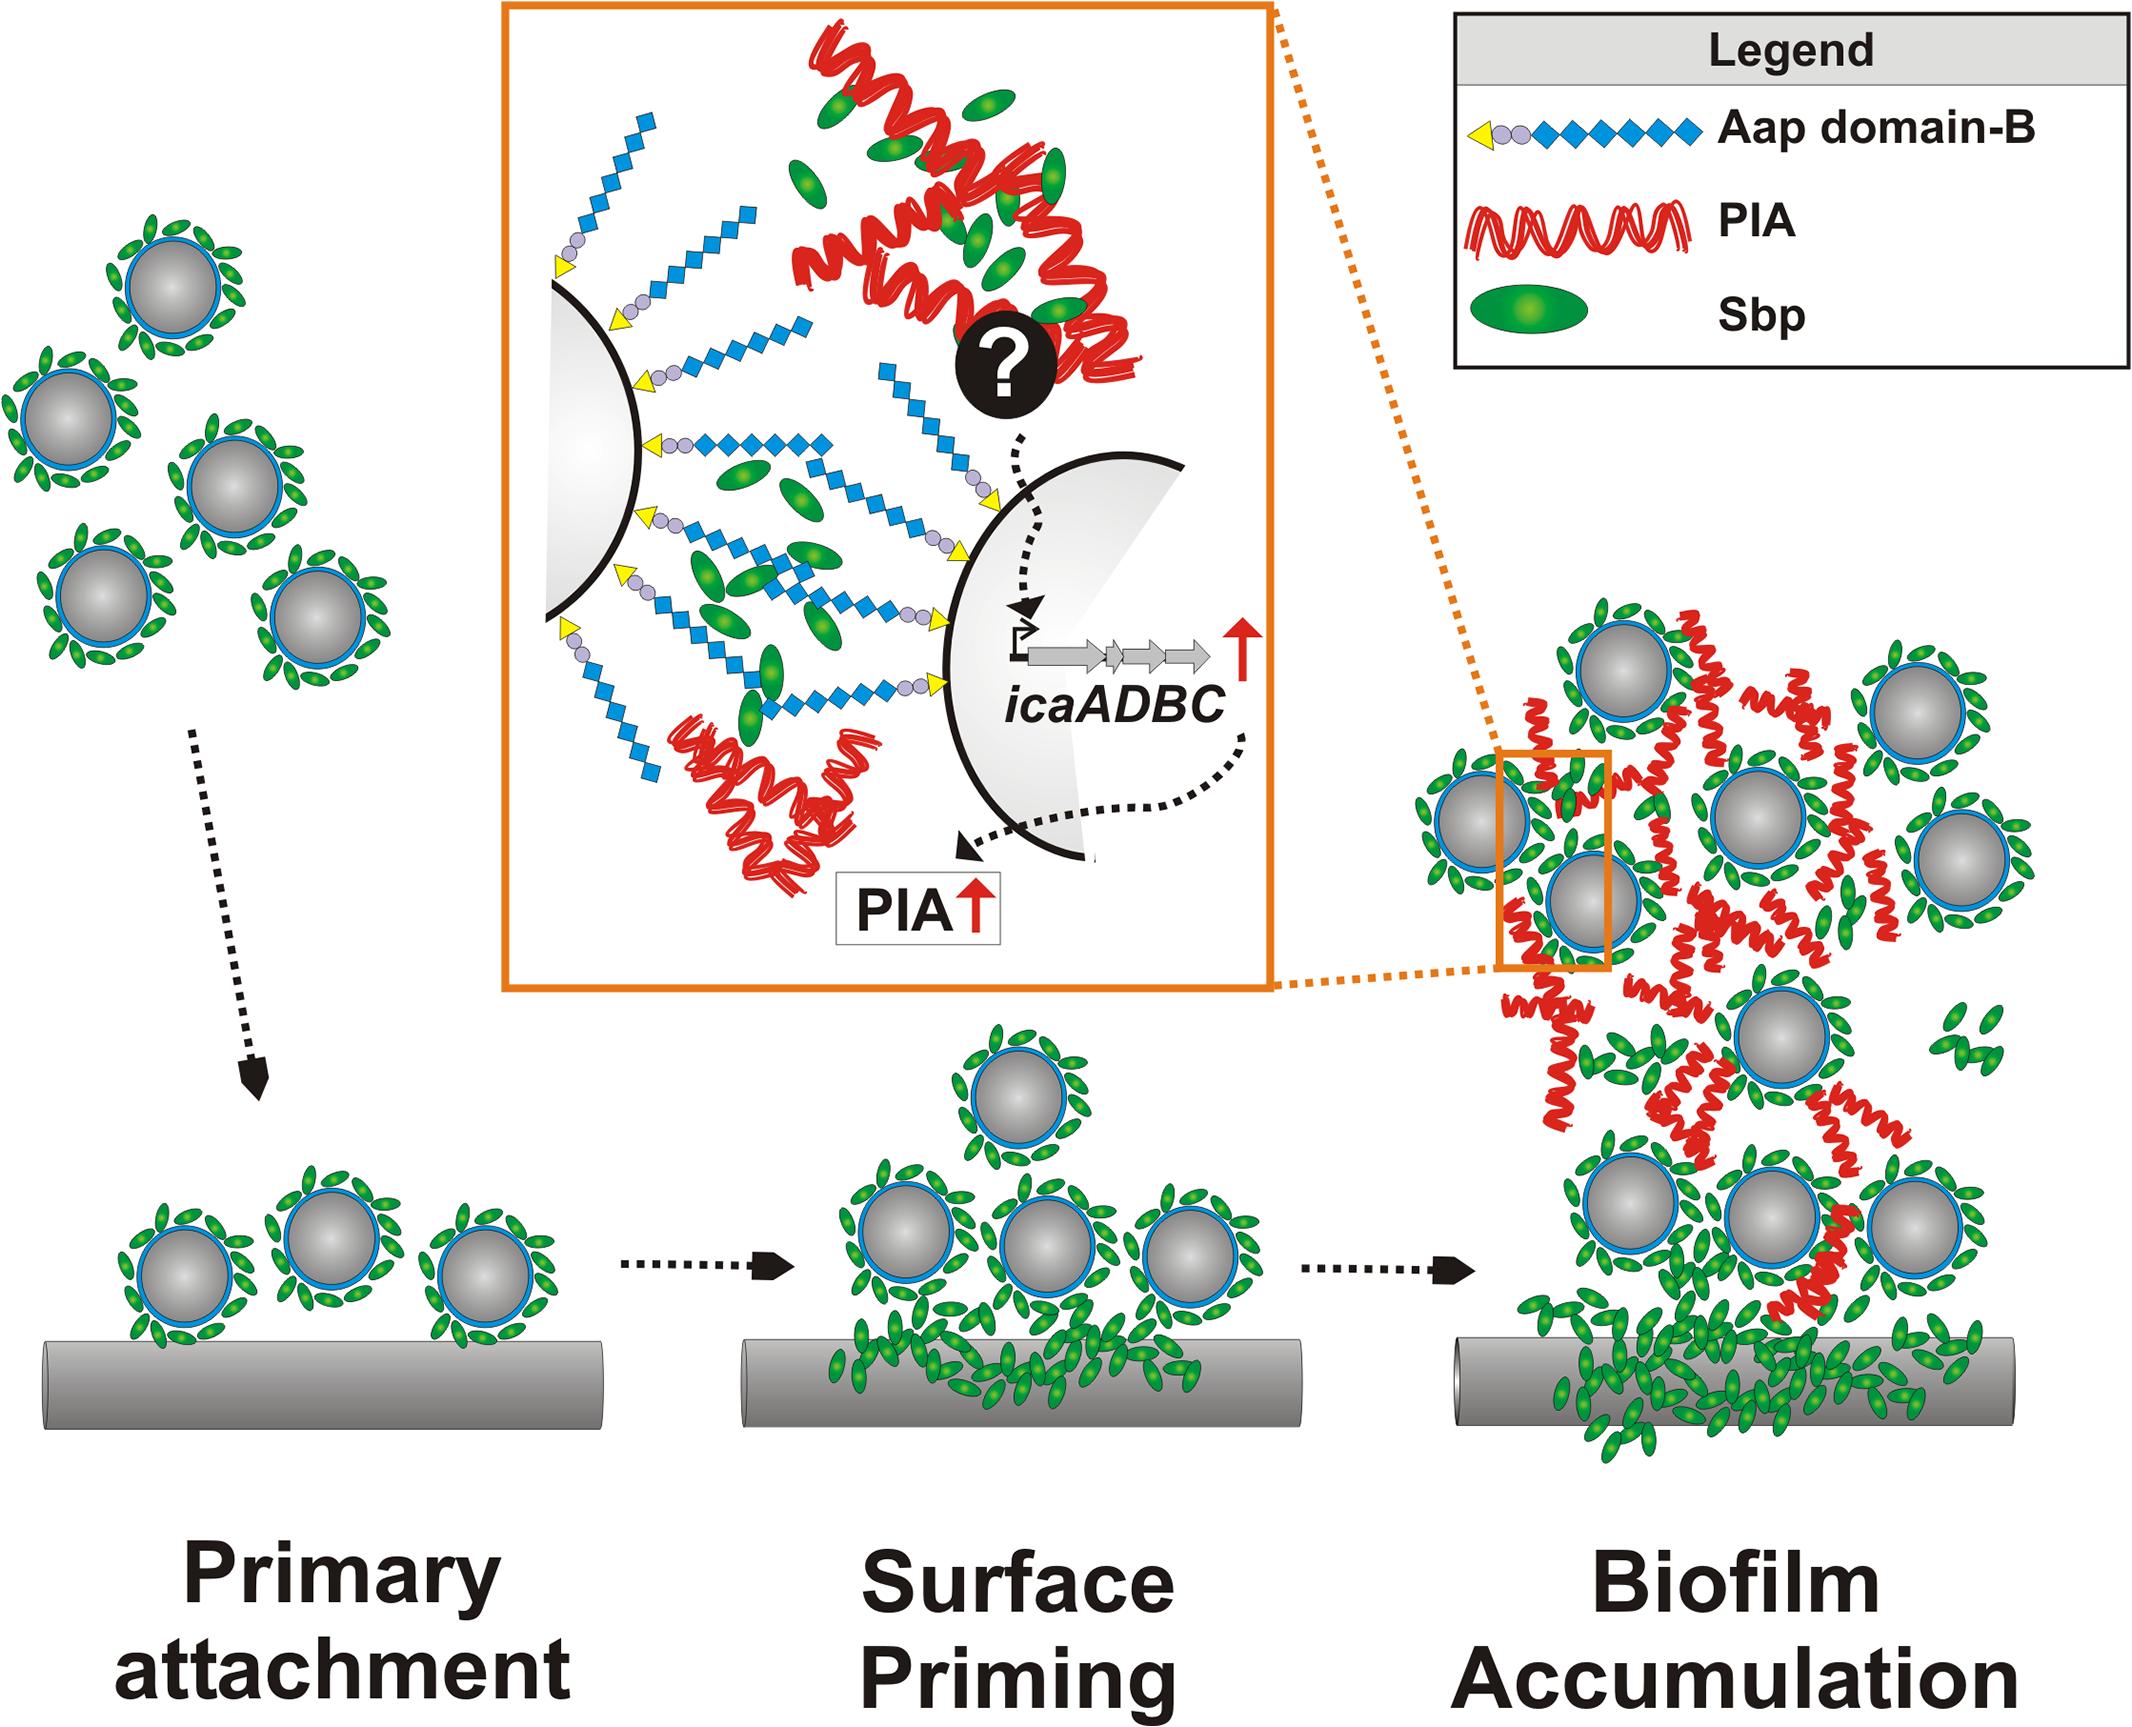 Integrated model of Sbp functions in <i>S</i>. <i>epidermidis</i> biofilm formation.